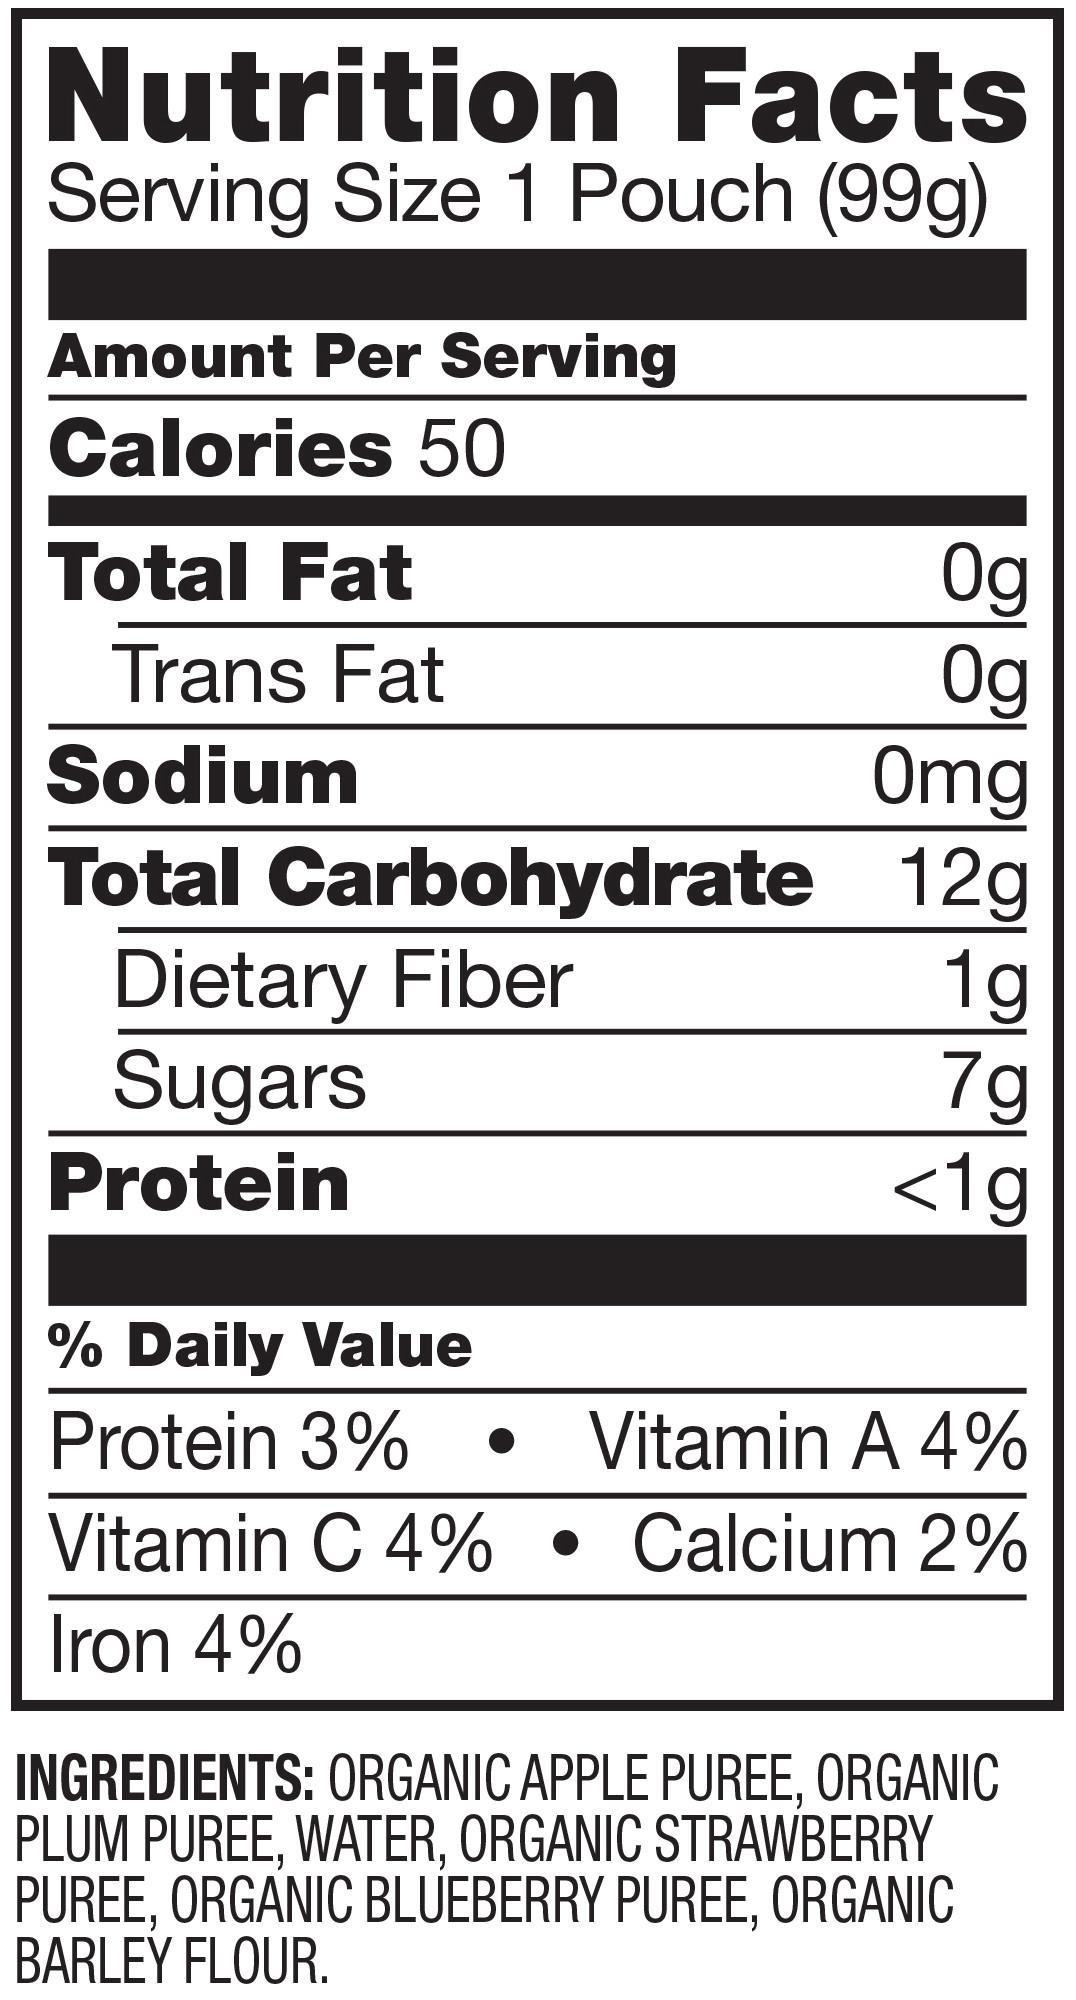 Applesauce Nutrition Facts  Motts Blueberry Applesauce Nutrition Facts – Nutrition Ftempo